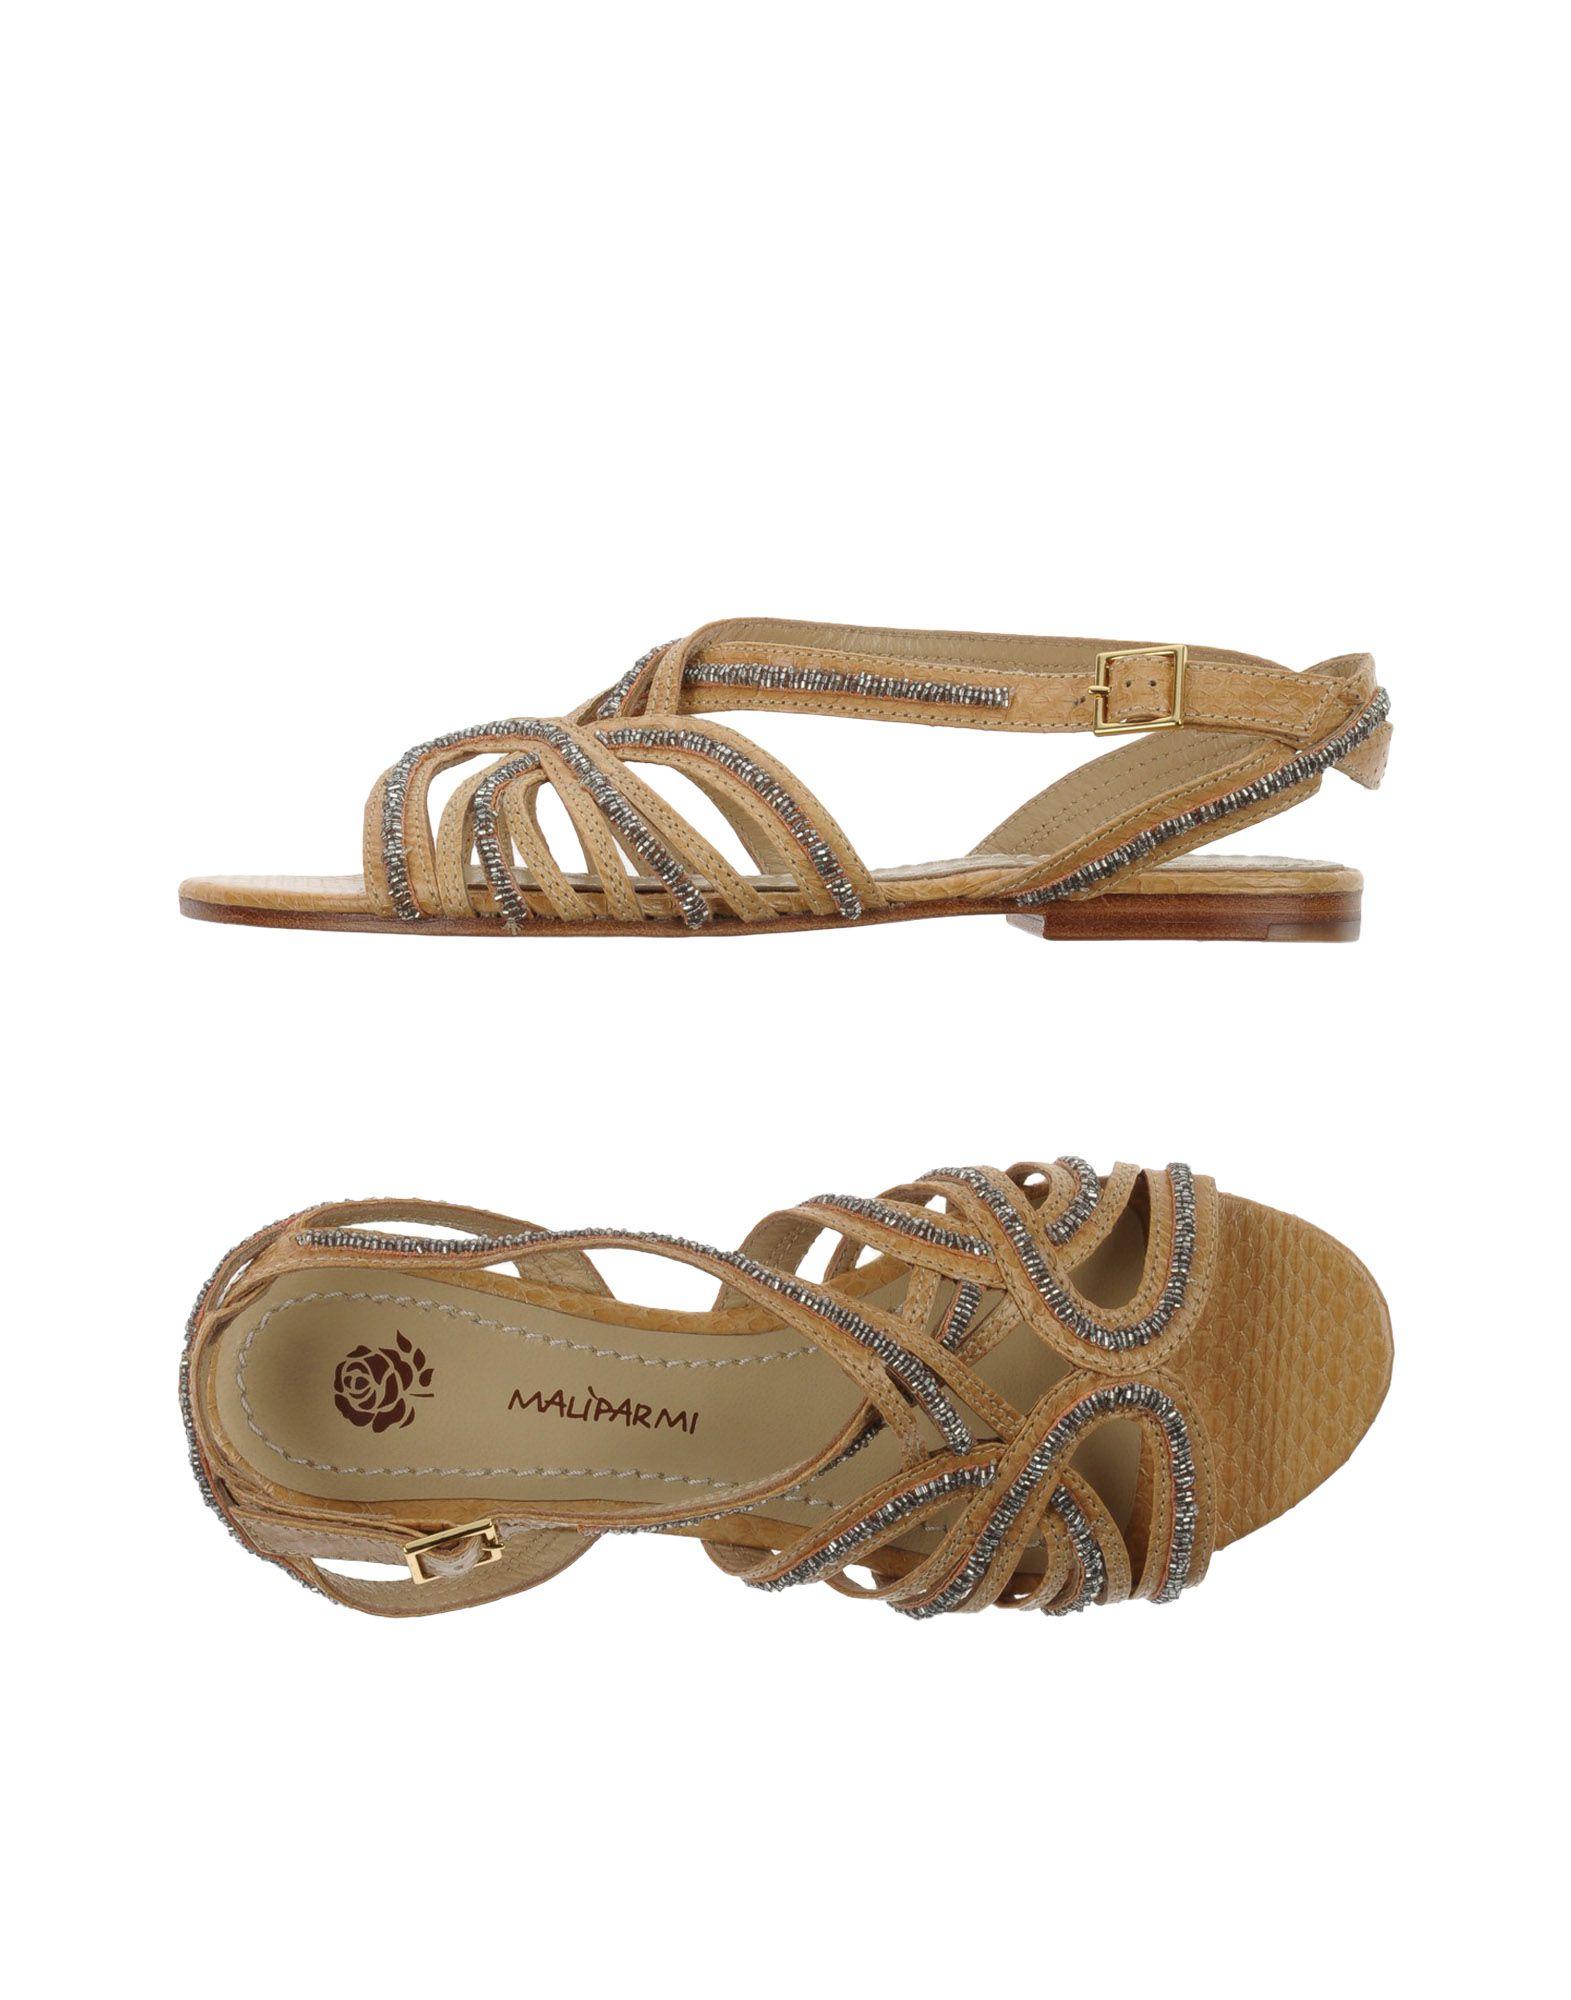 Stilvolle Damen billige Schuhe Malìparmi Sandalen Damen Stilvolle  11110204WT 717fed